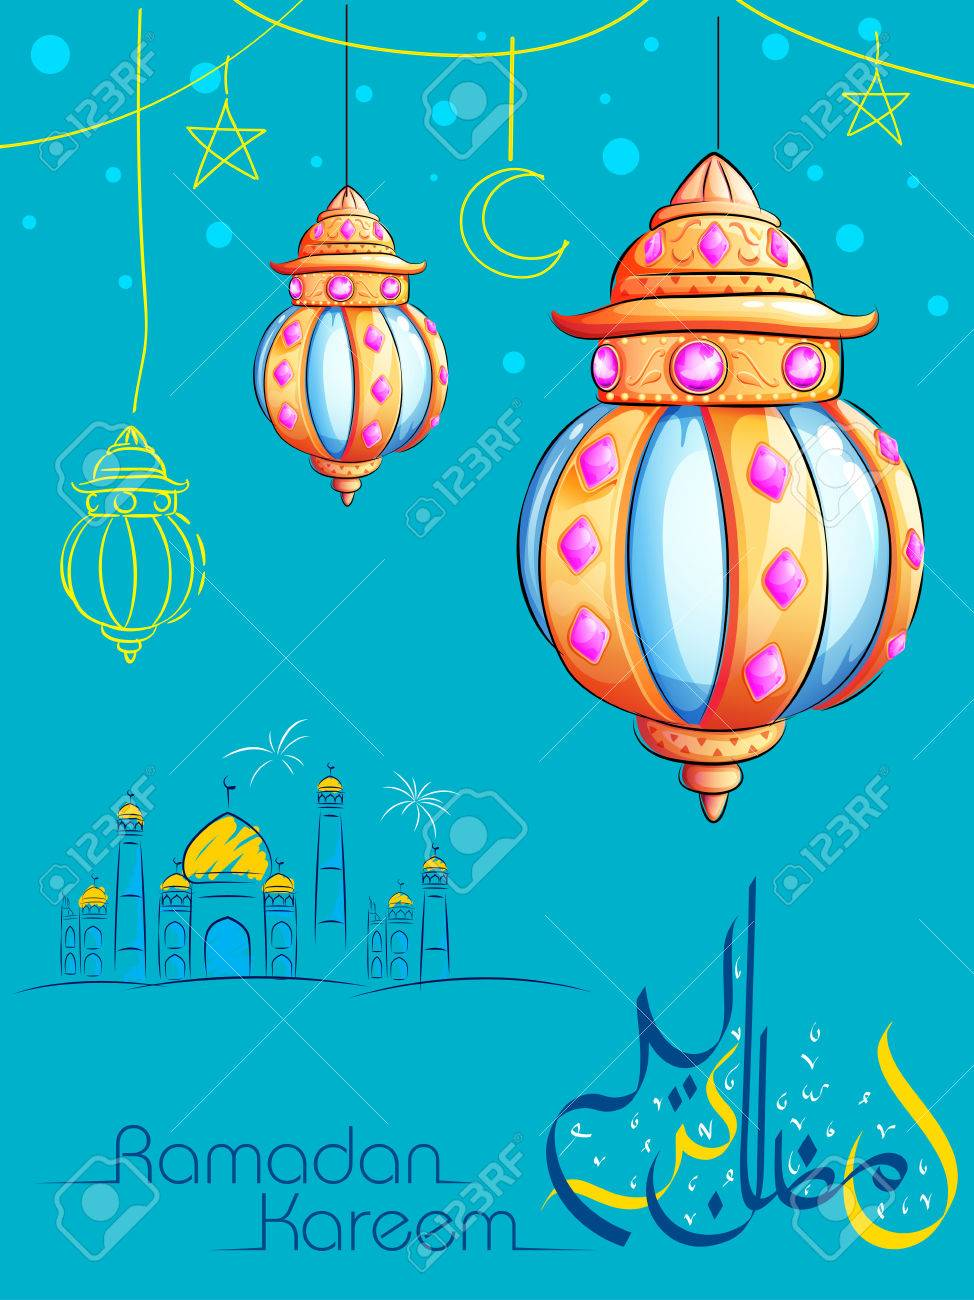 Illustration Of Ramadan Kareem Greeting In Arabic Freehand With